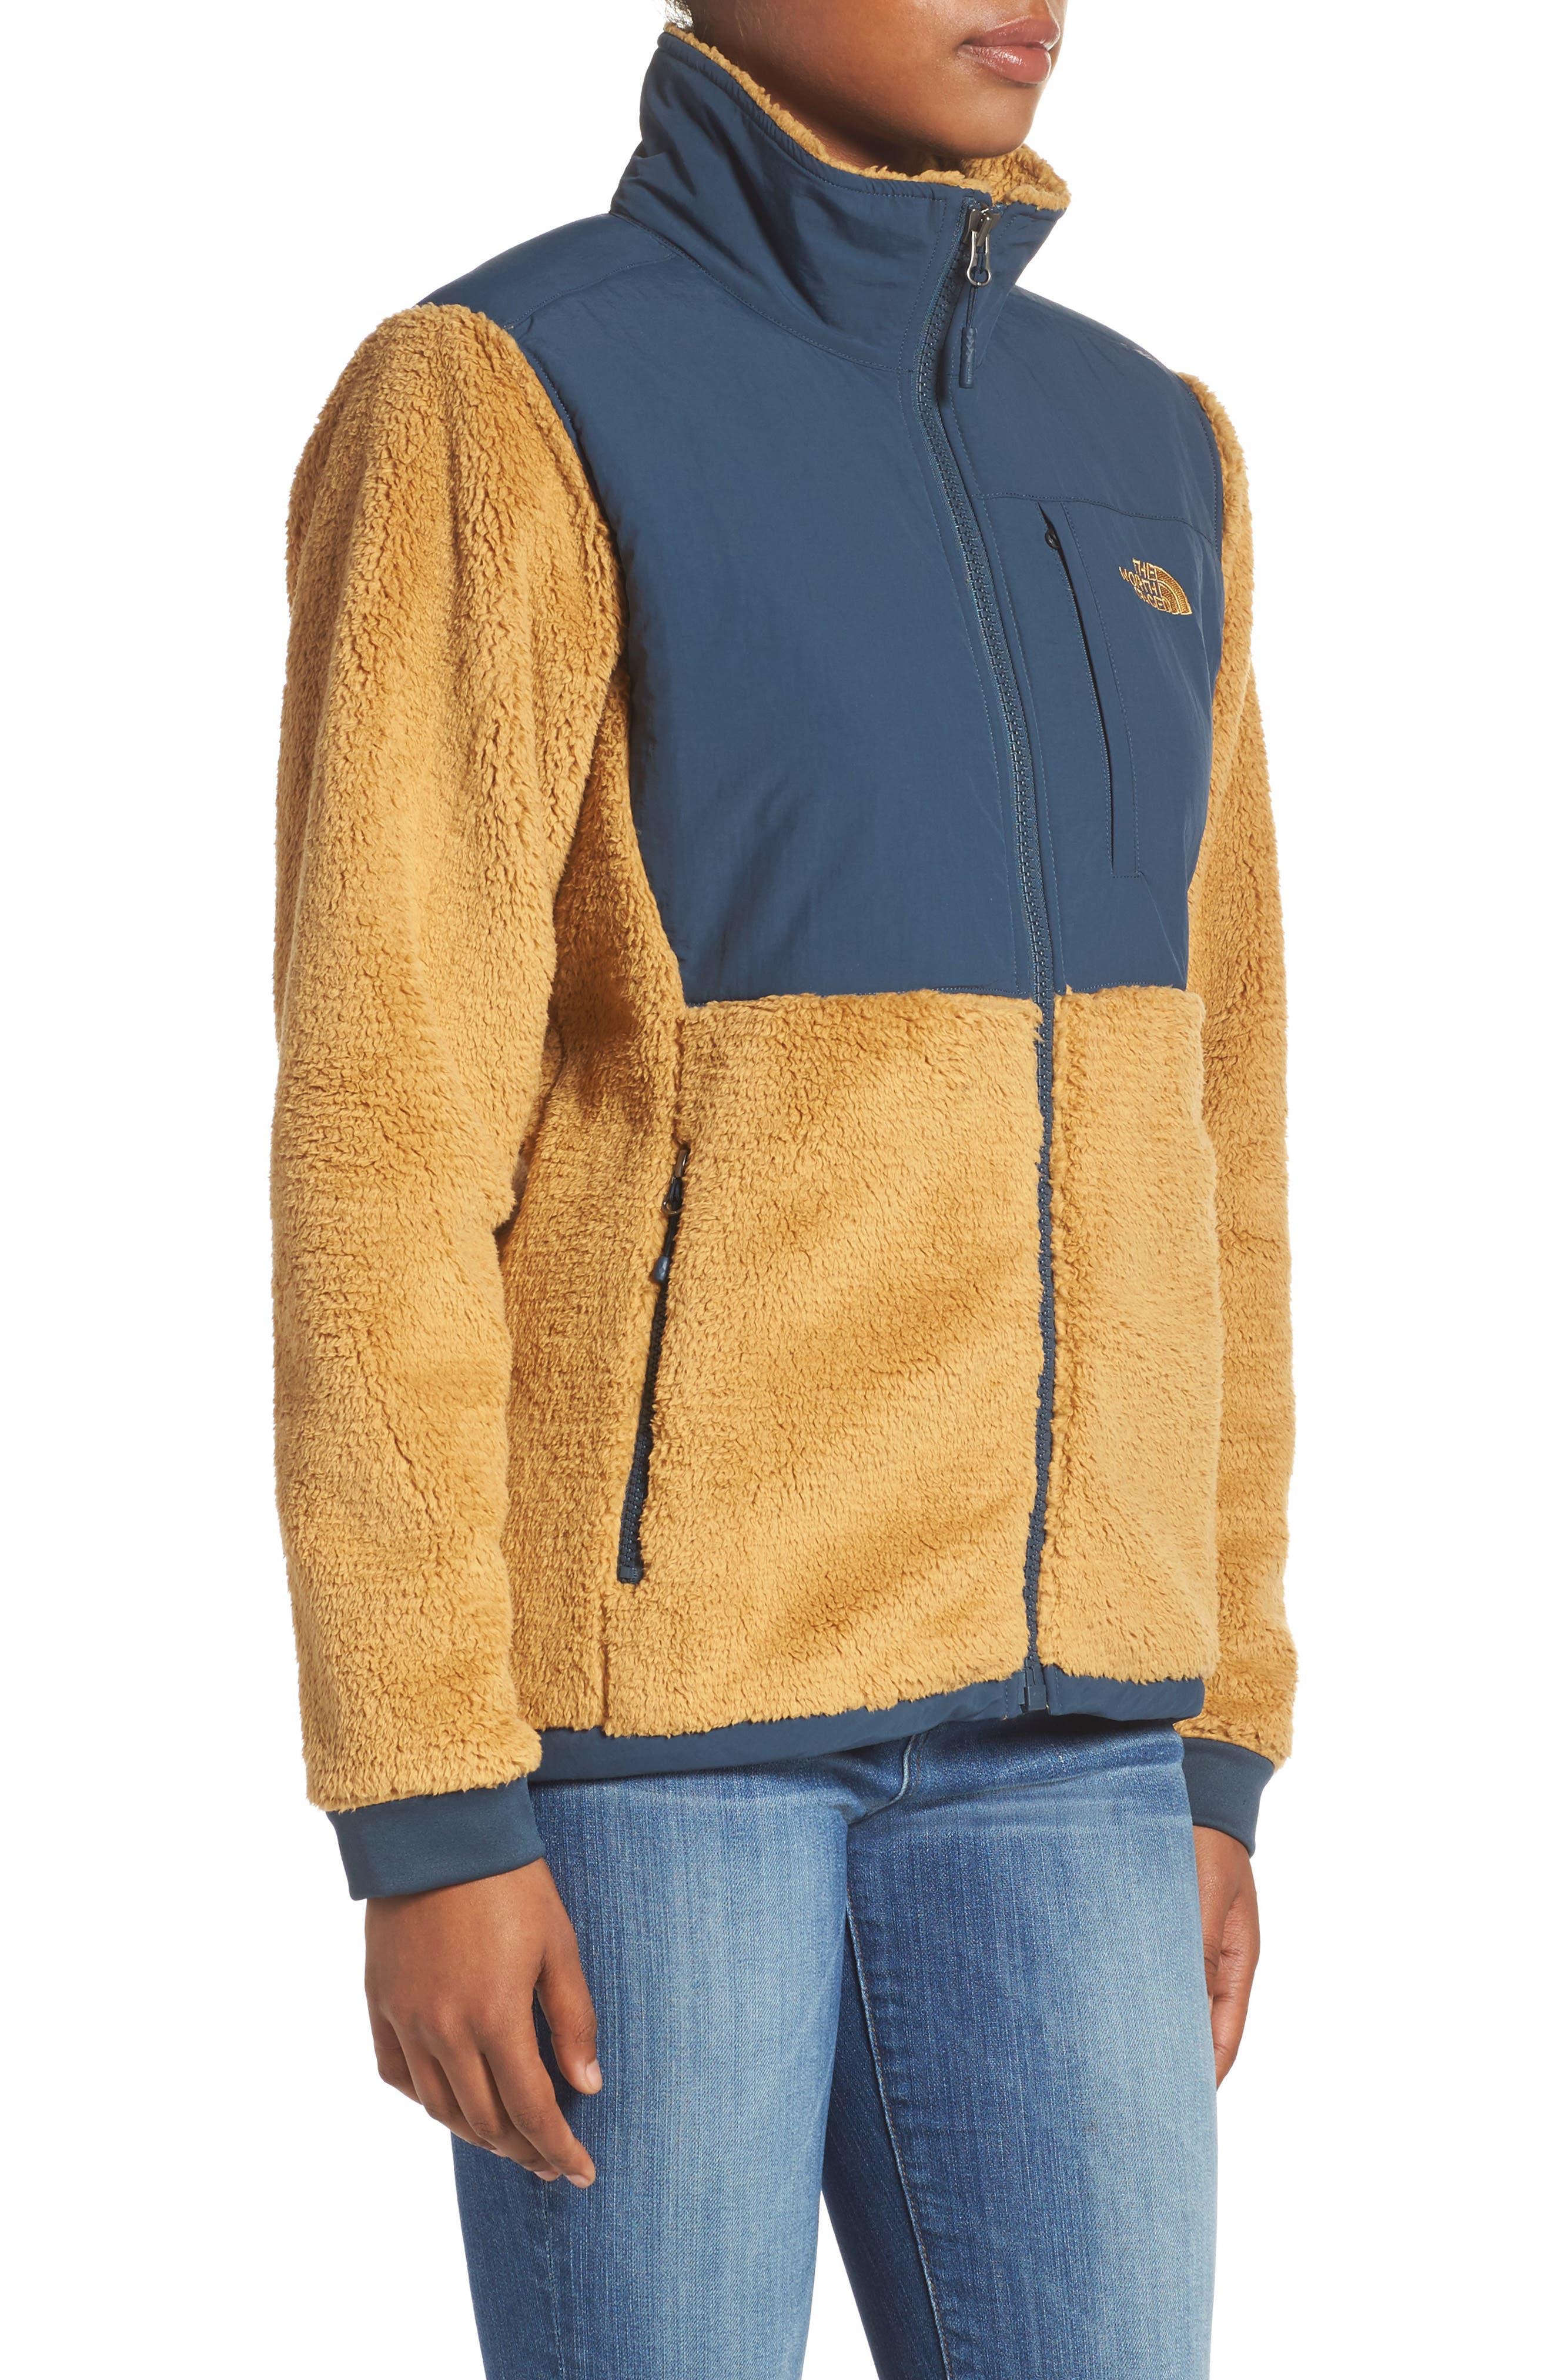 Novelty Denali Fleece Jacket,                             Alternate thumbnail 3, color,                             251